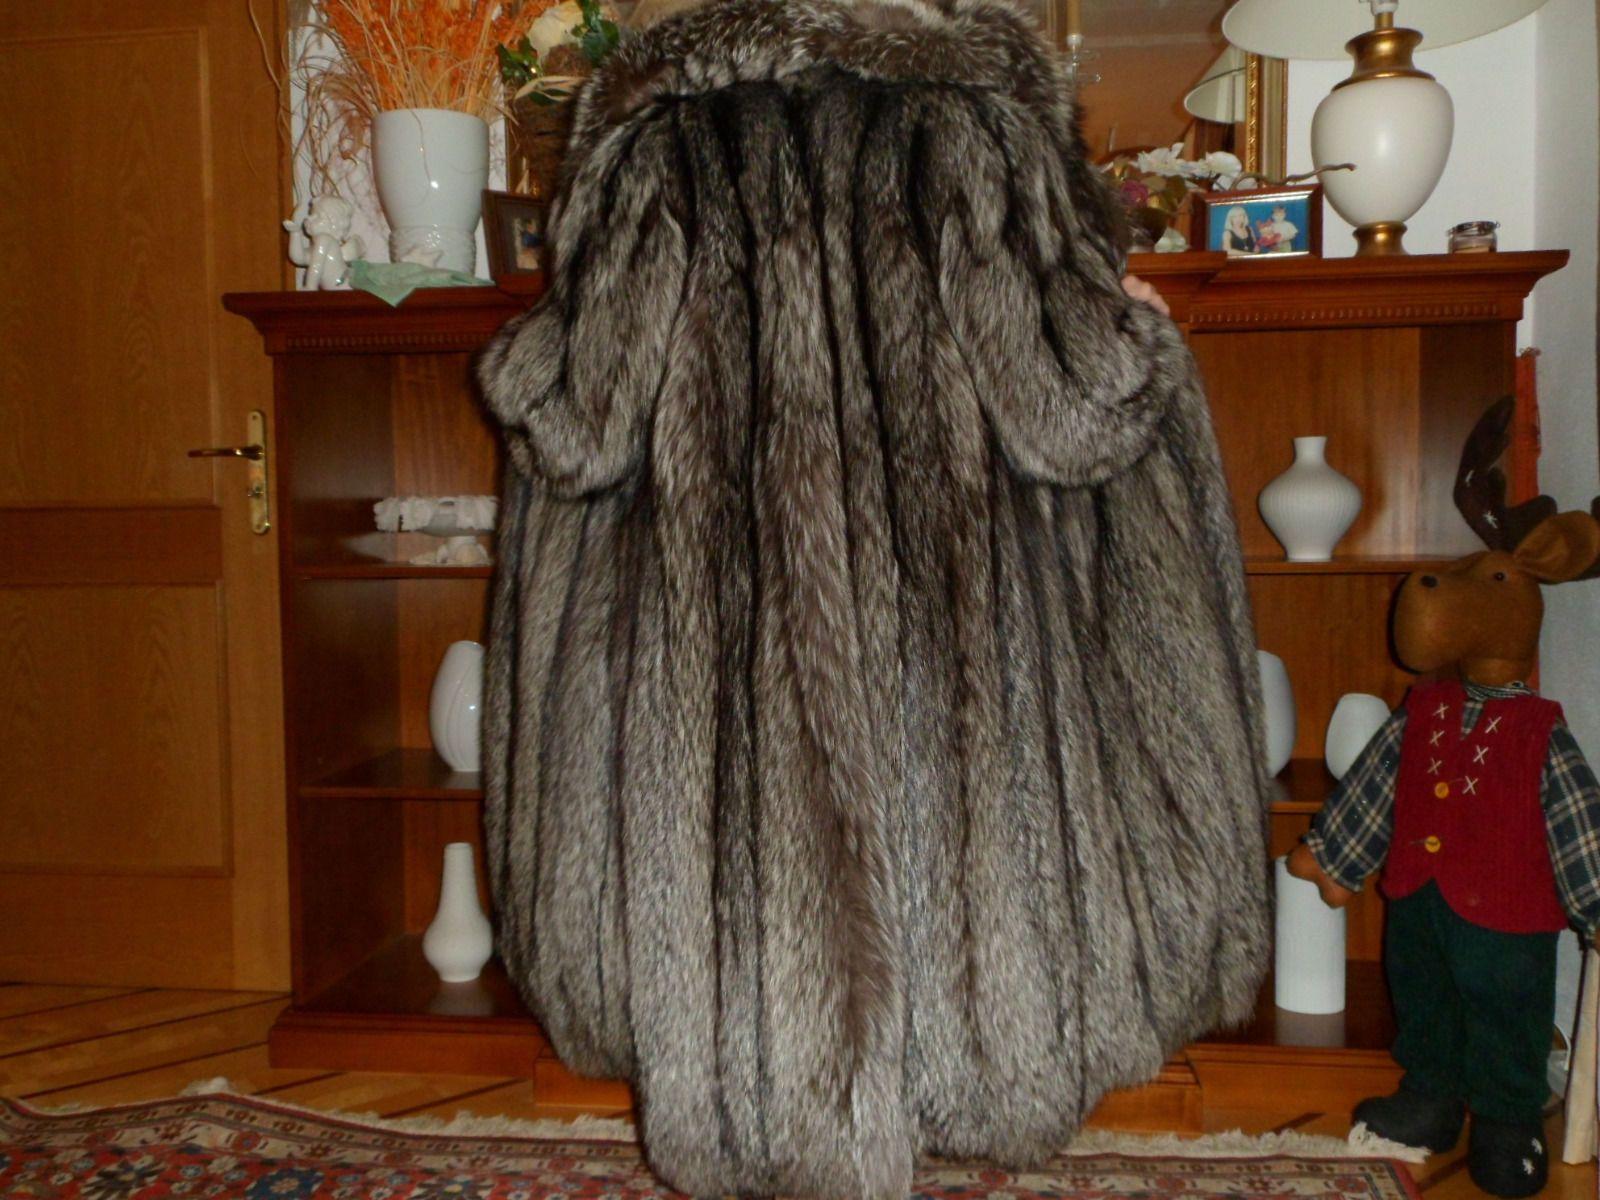 Silberfuchsmantel Silberfuchs Mantel Pelz Pelzmantel Saga Fox 119 cm lang Rieger | eBay